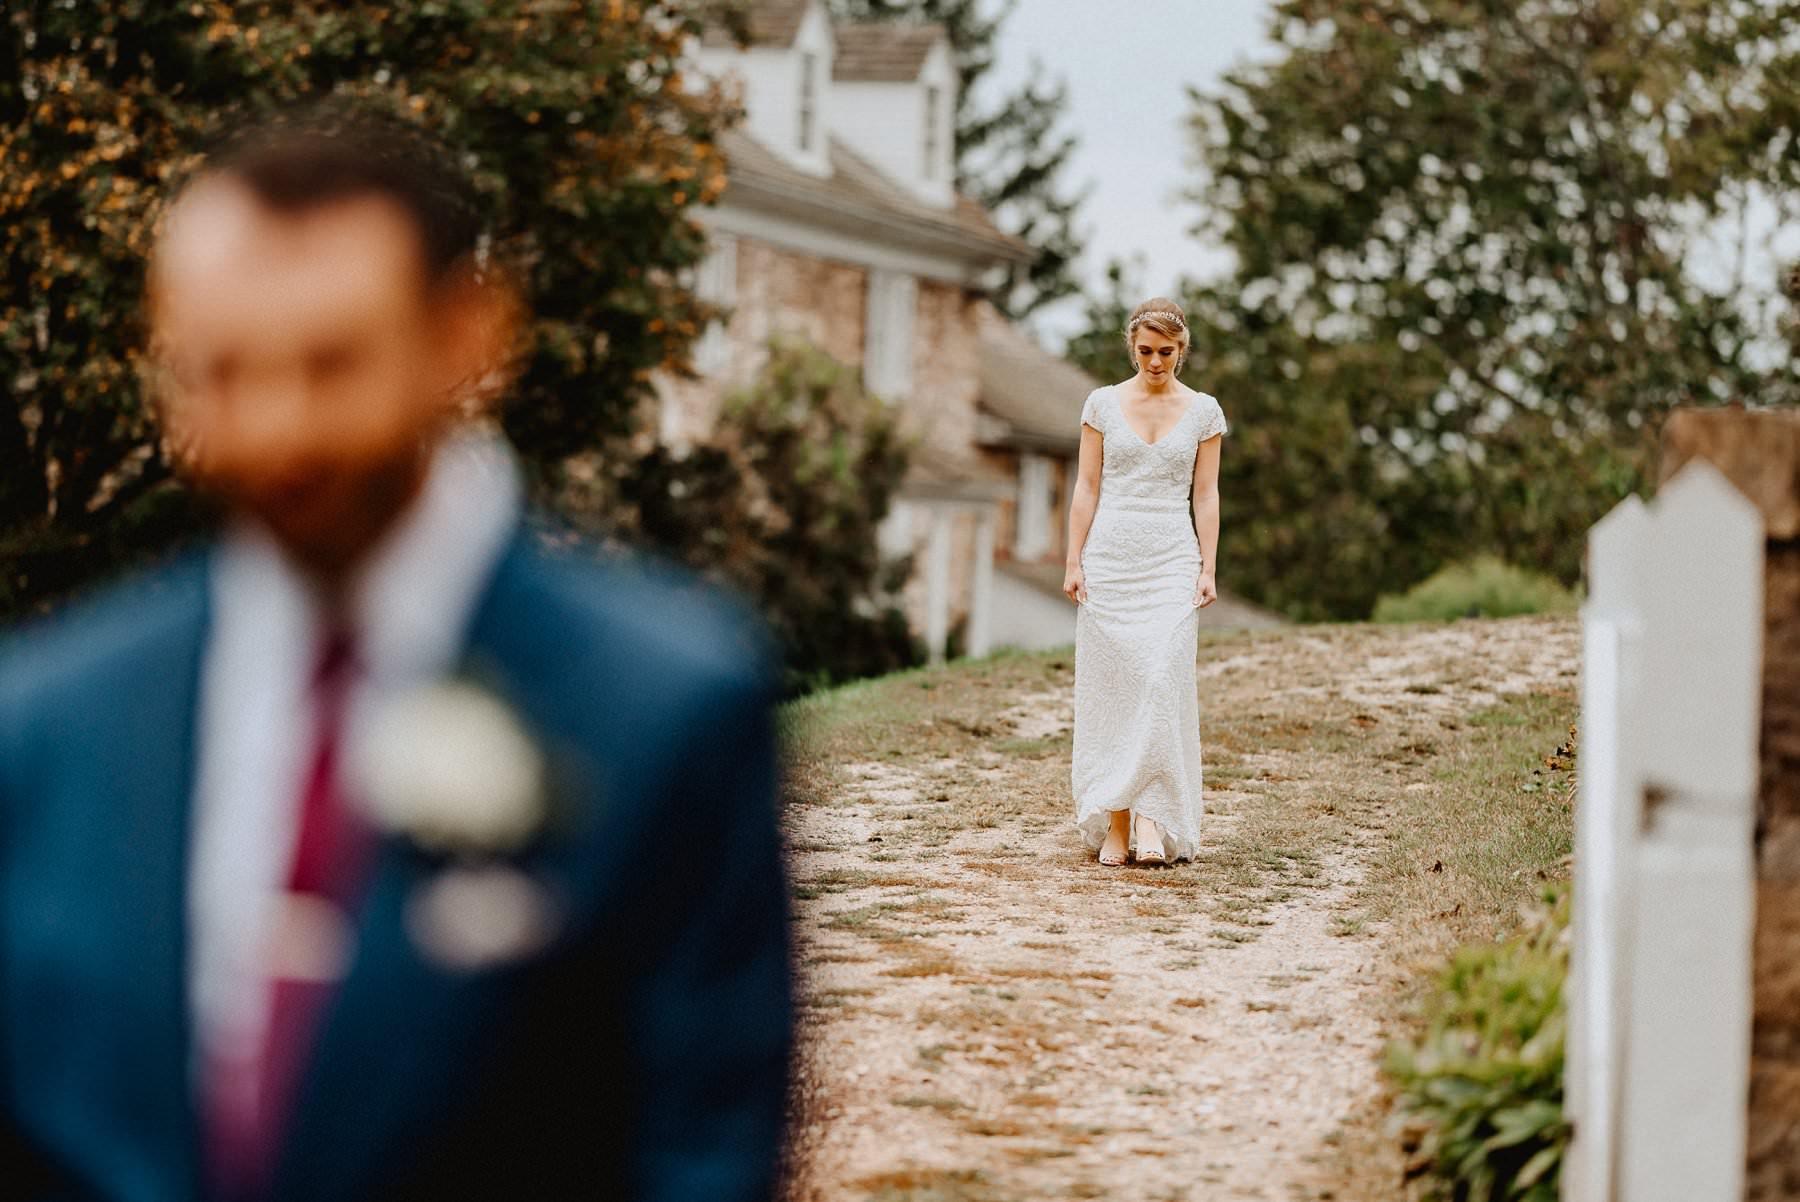 John_James_Audubon_Center_wedding-6.jpg